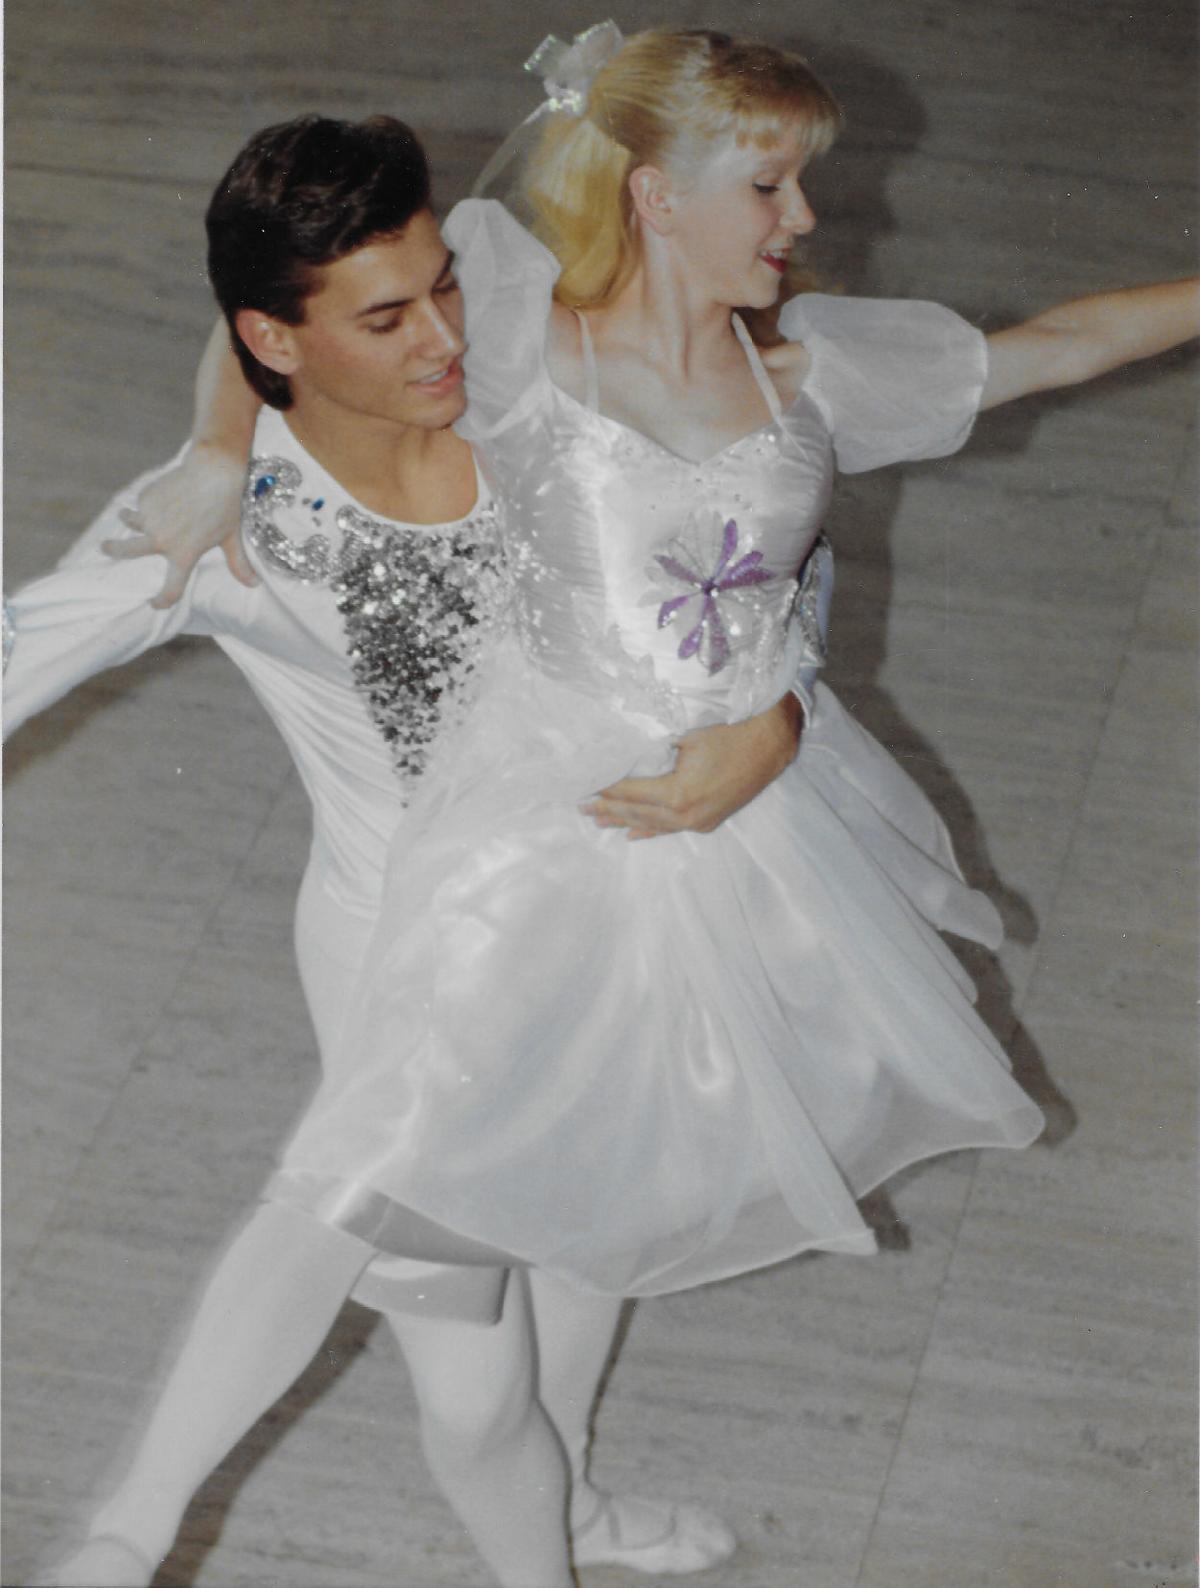 Jarrod Ronhovde as Nutcracker and Hilary Johnson as Clara in December 1989